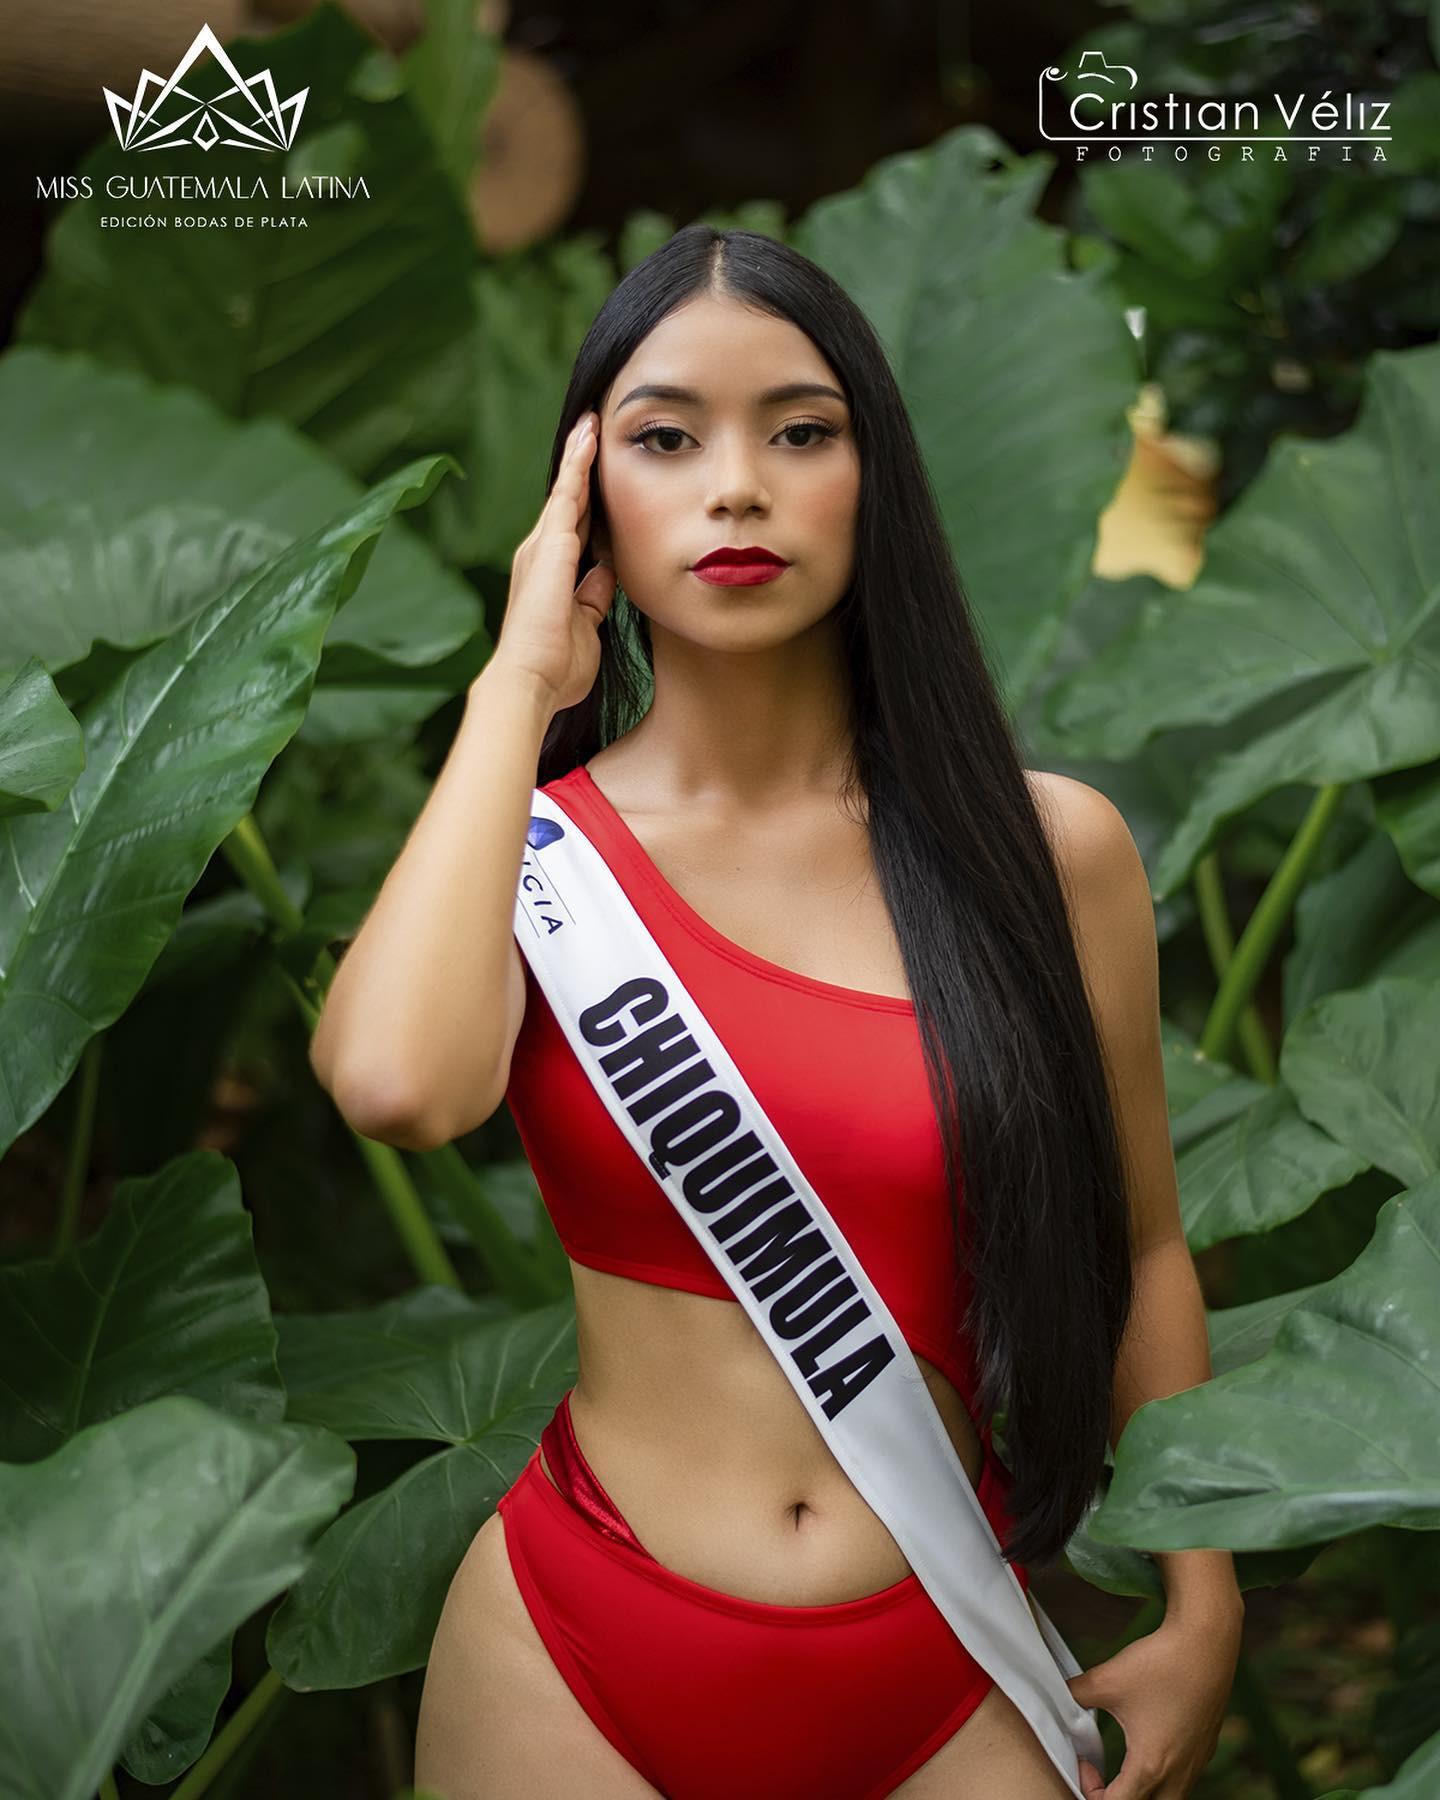 candidatas a miss guatemala latina 2021. final: 30 de abril. - Página 4 B3TnwJ